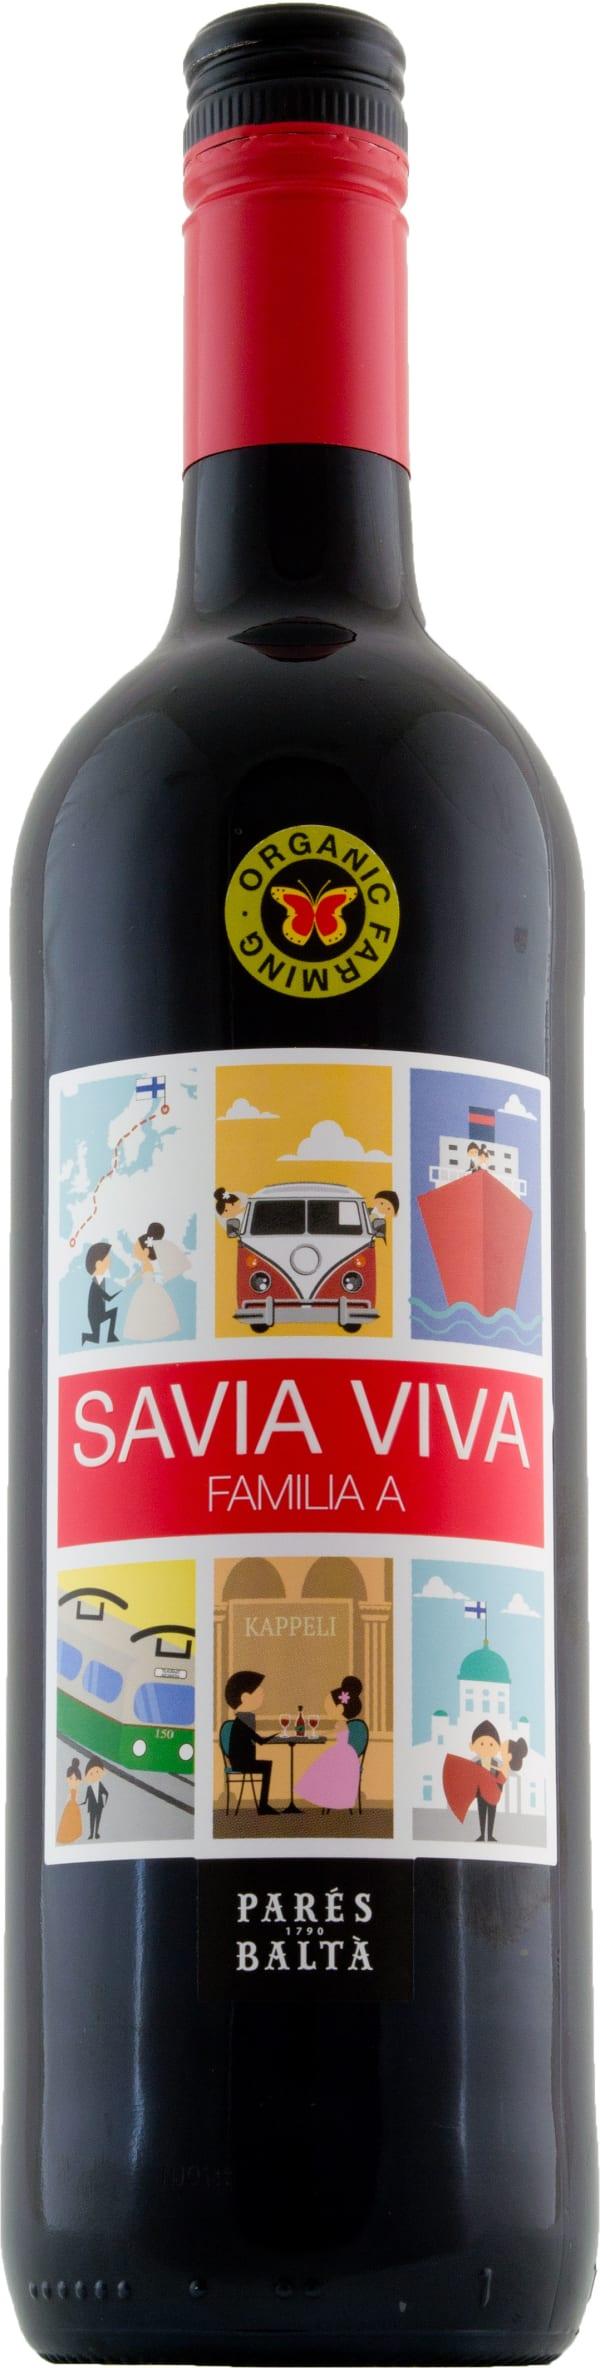 Savia Viva Organic A Tinto 2015